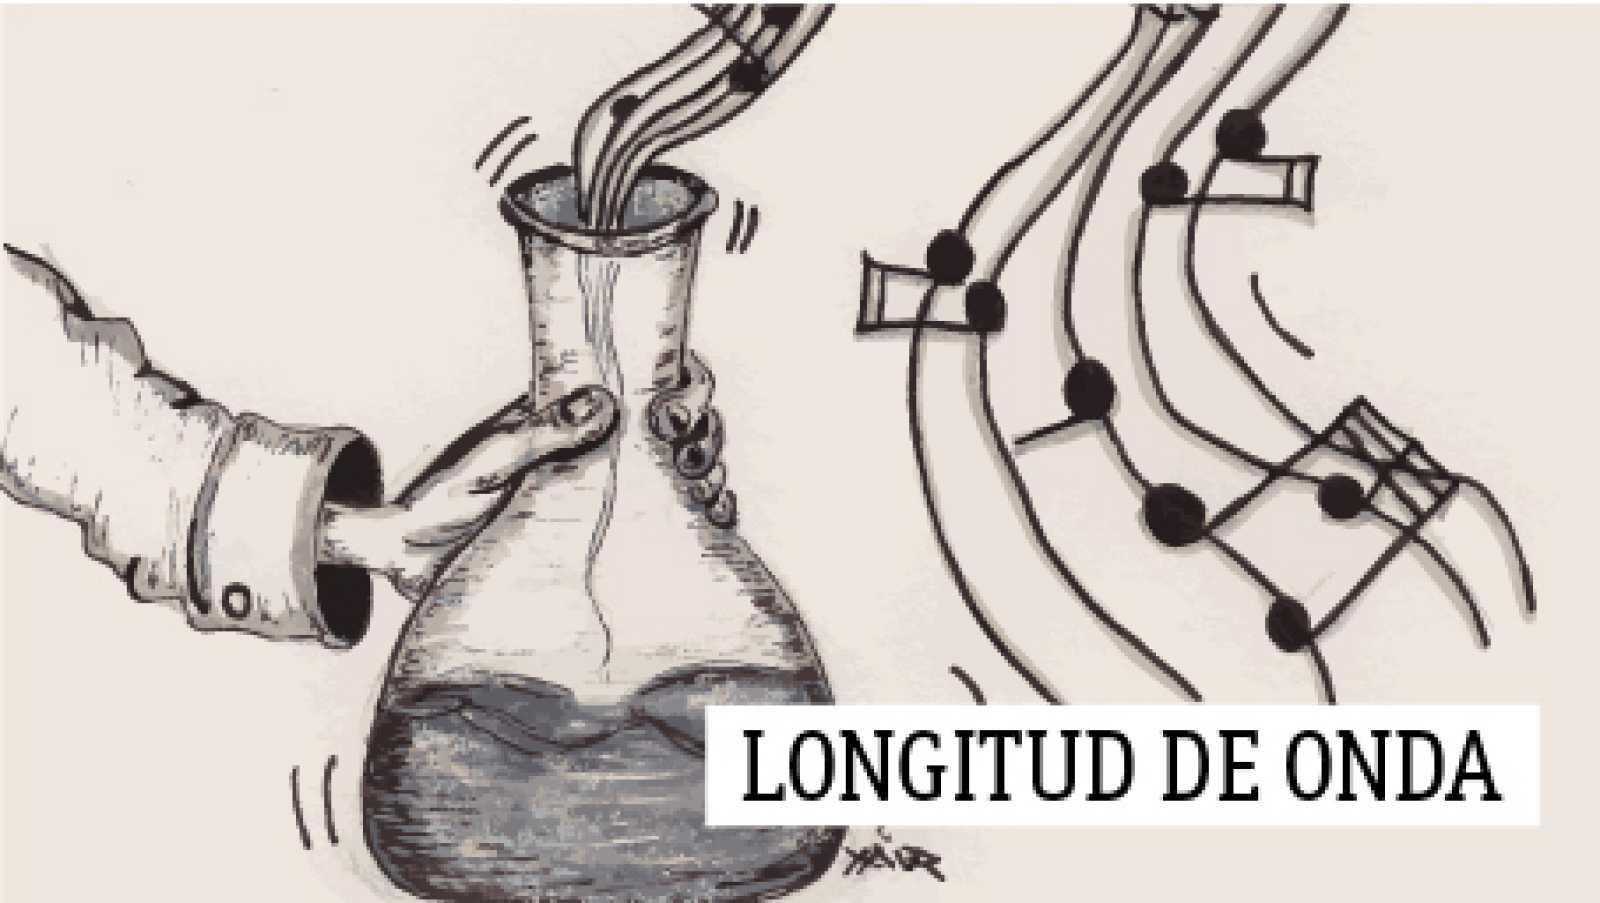 Longitud de onda - Silbatos aztecas y vasijas silbadoras - 22/02/19 - escuchar ahora